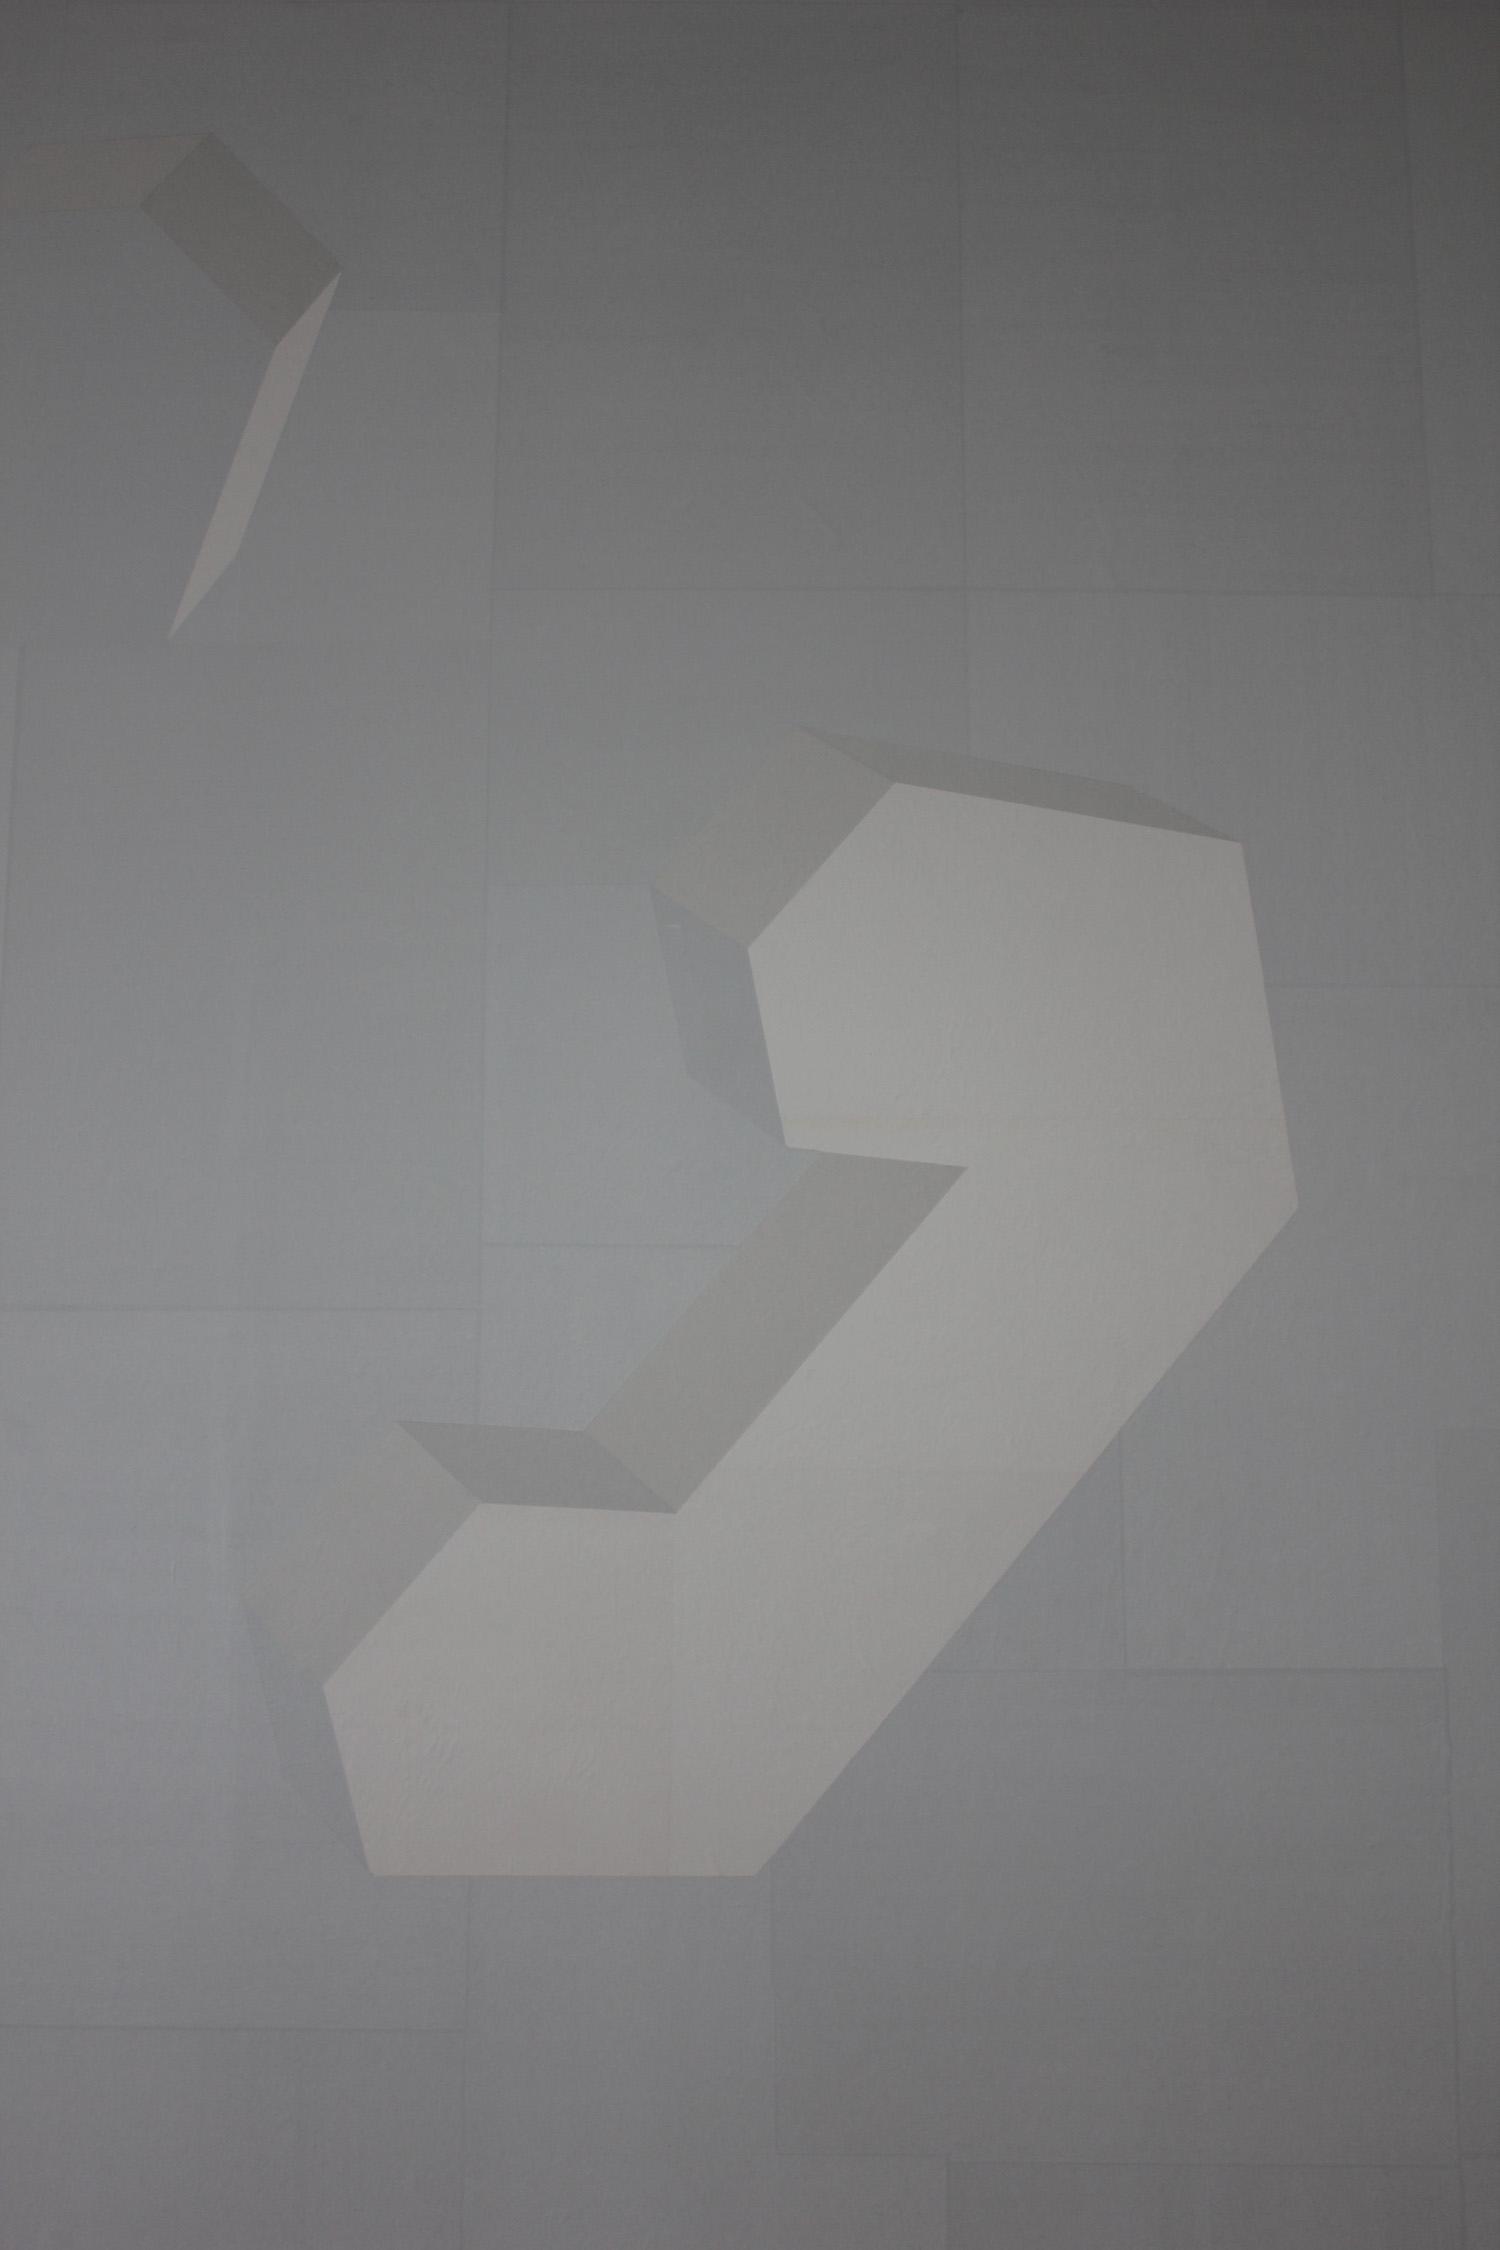 57-papercut-dlwp-detail2.jpeg